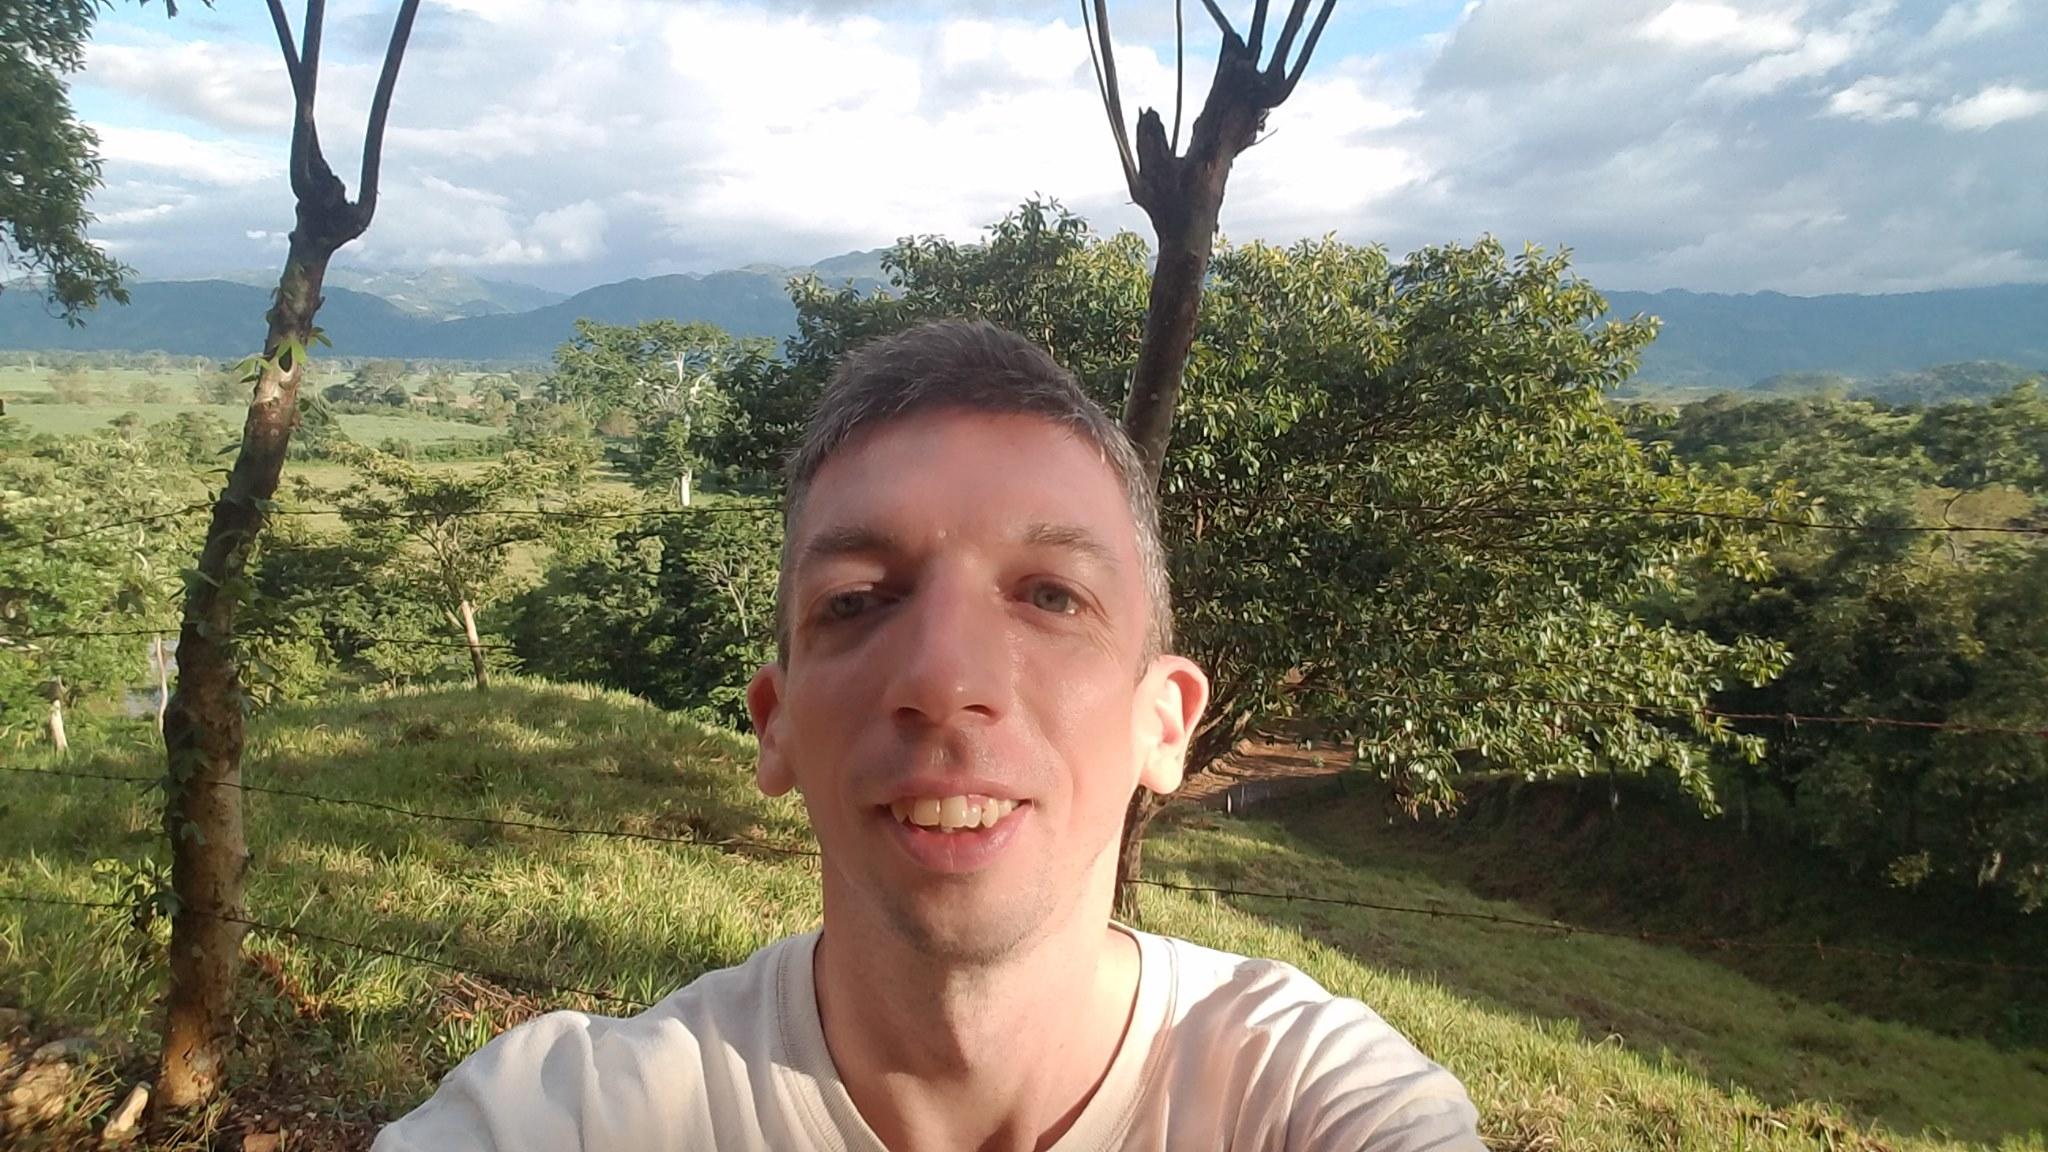 Rick Arnold Avatar - Larger - 74276085_144210773617704_5216330406256705536_o.jpg